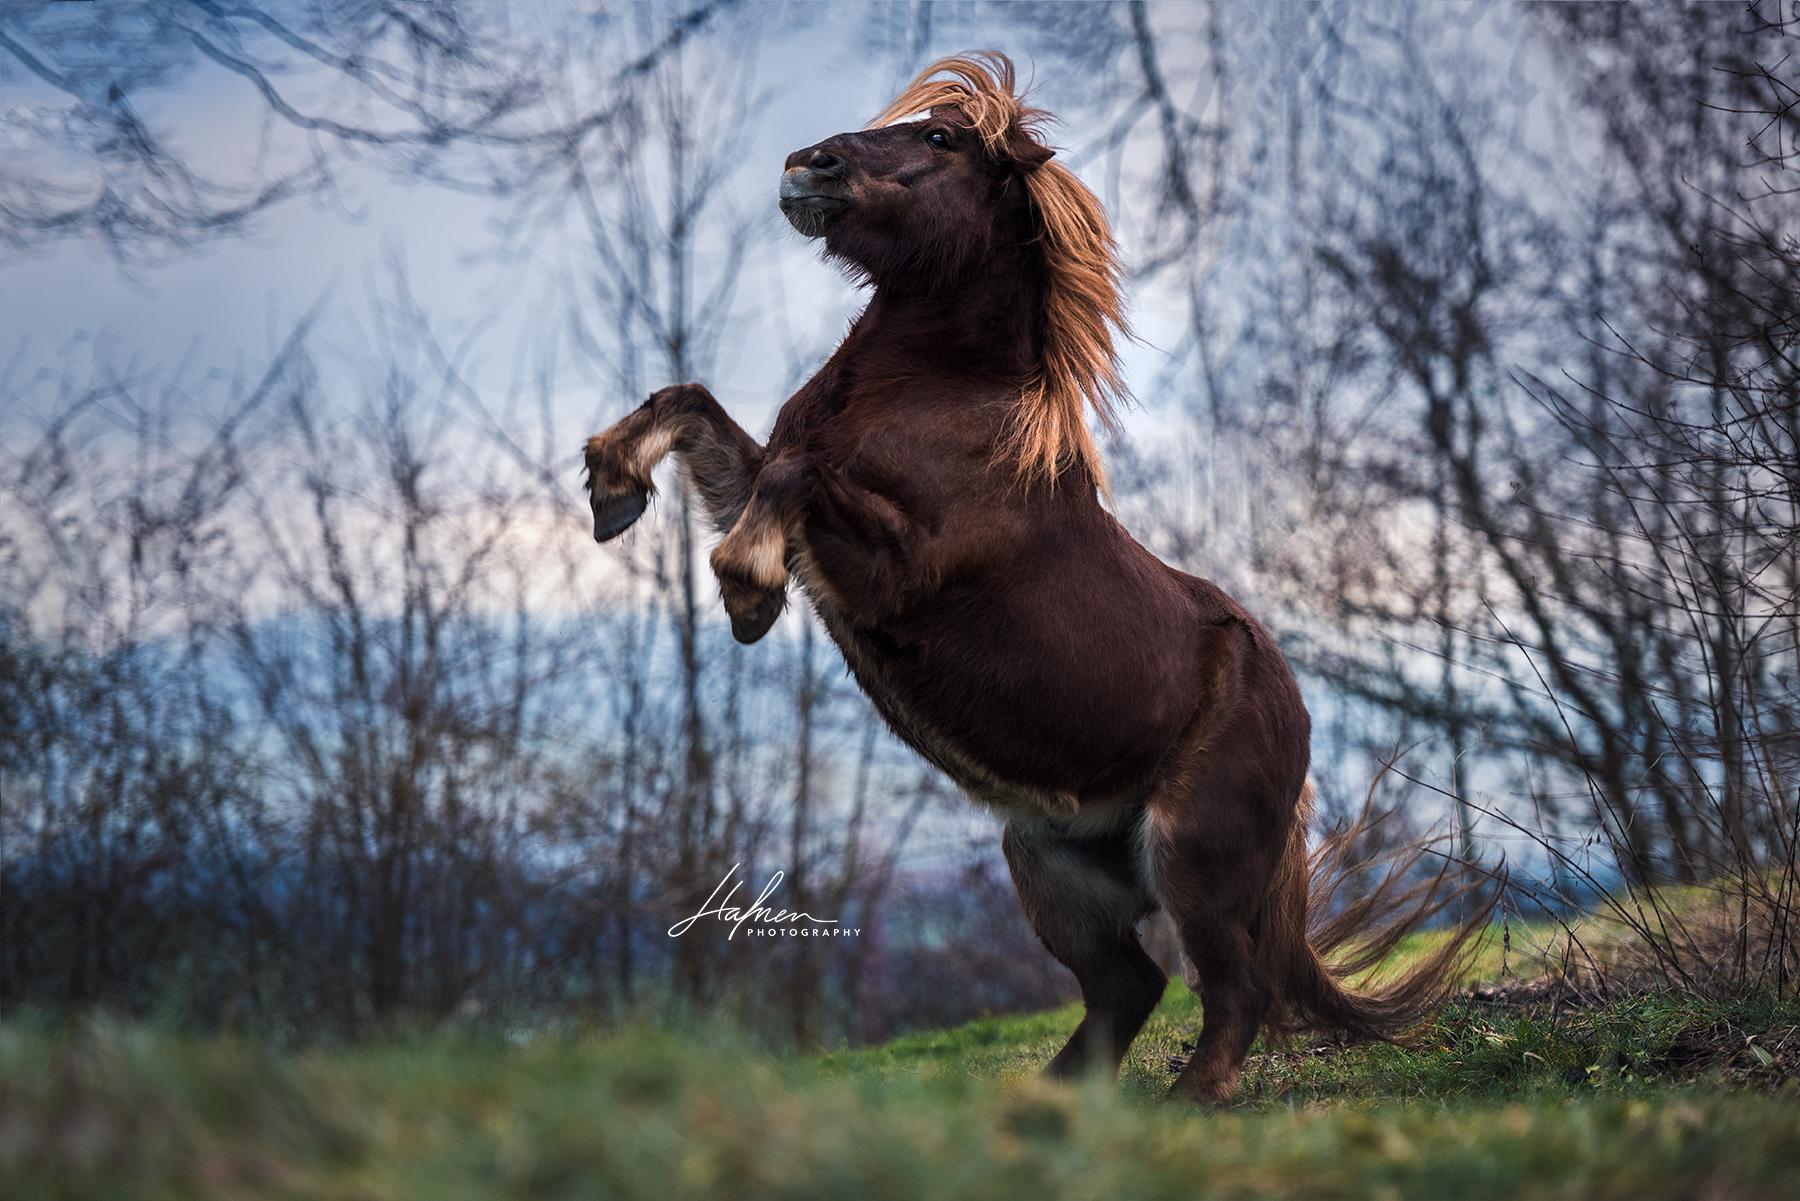 shetland pony zeigt kunstück | shetlandpony steigt